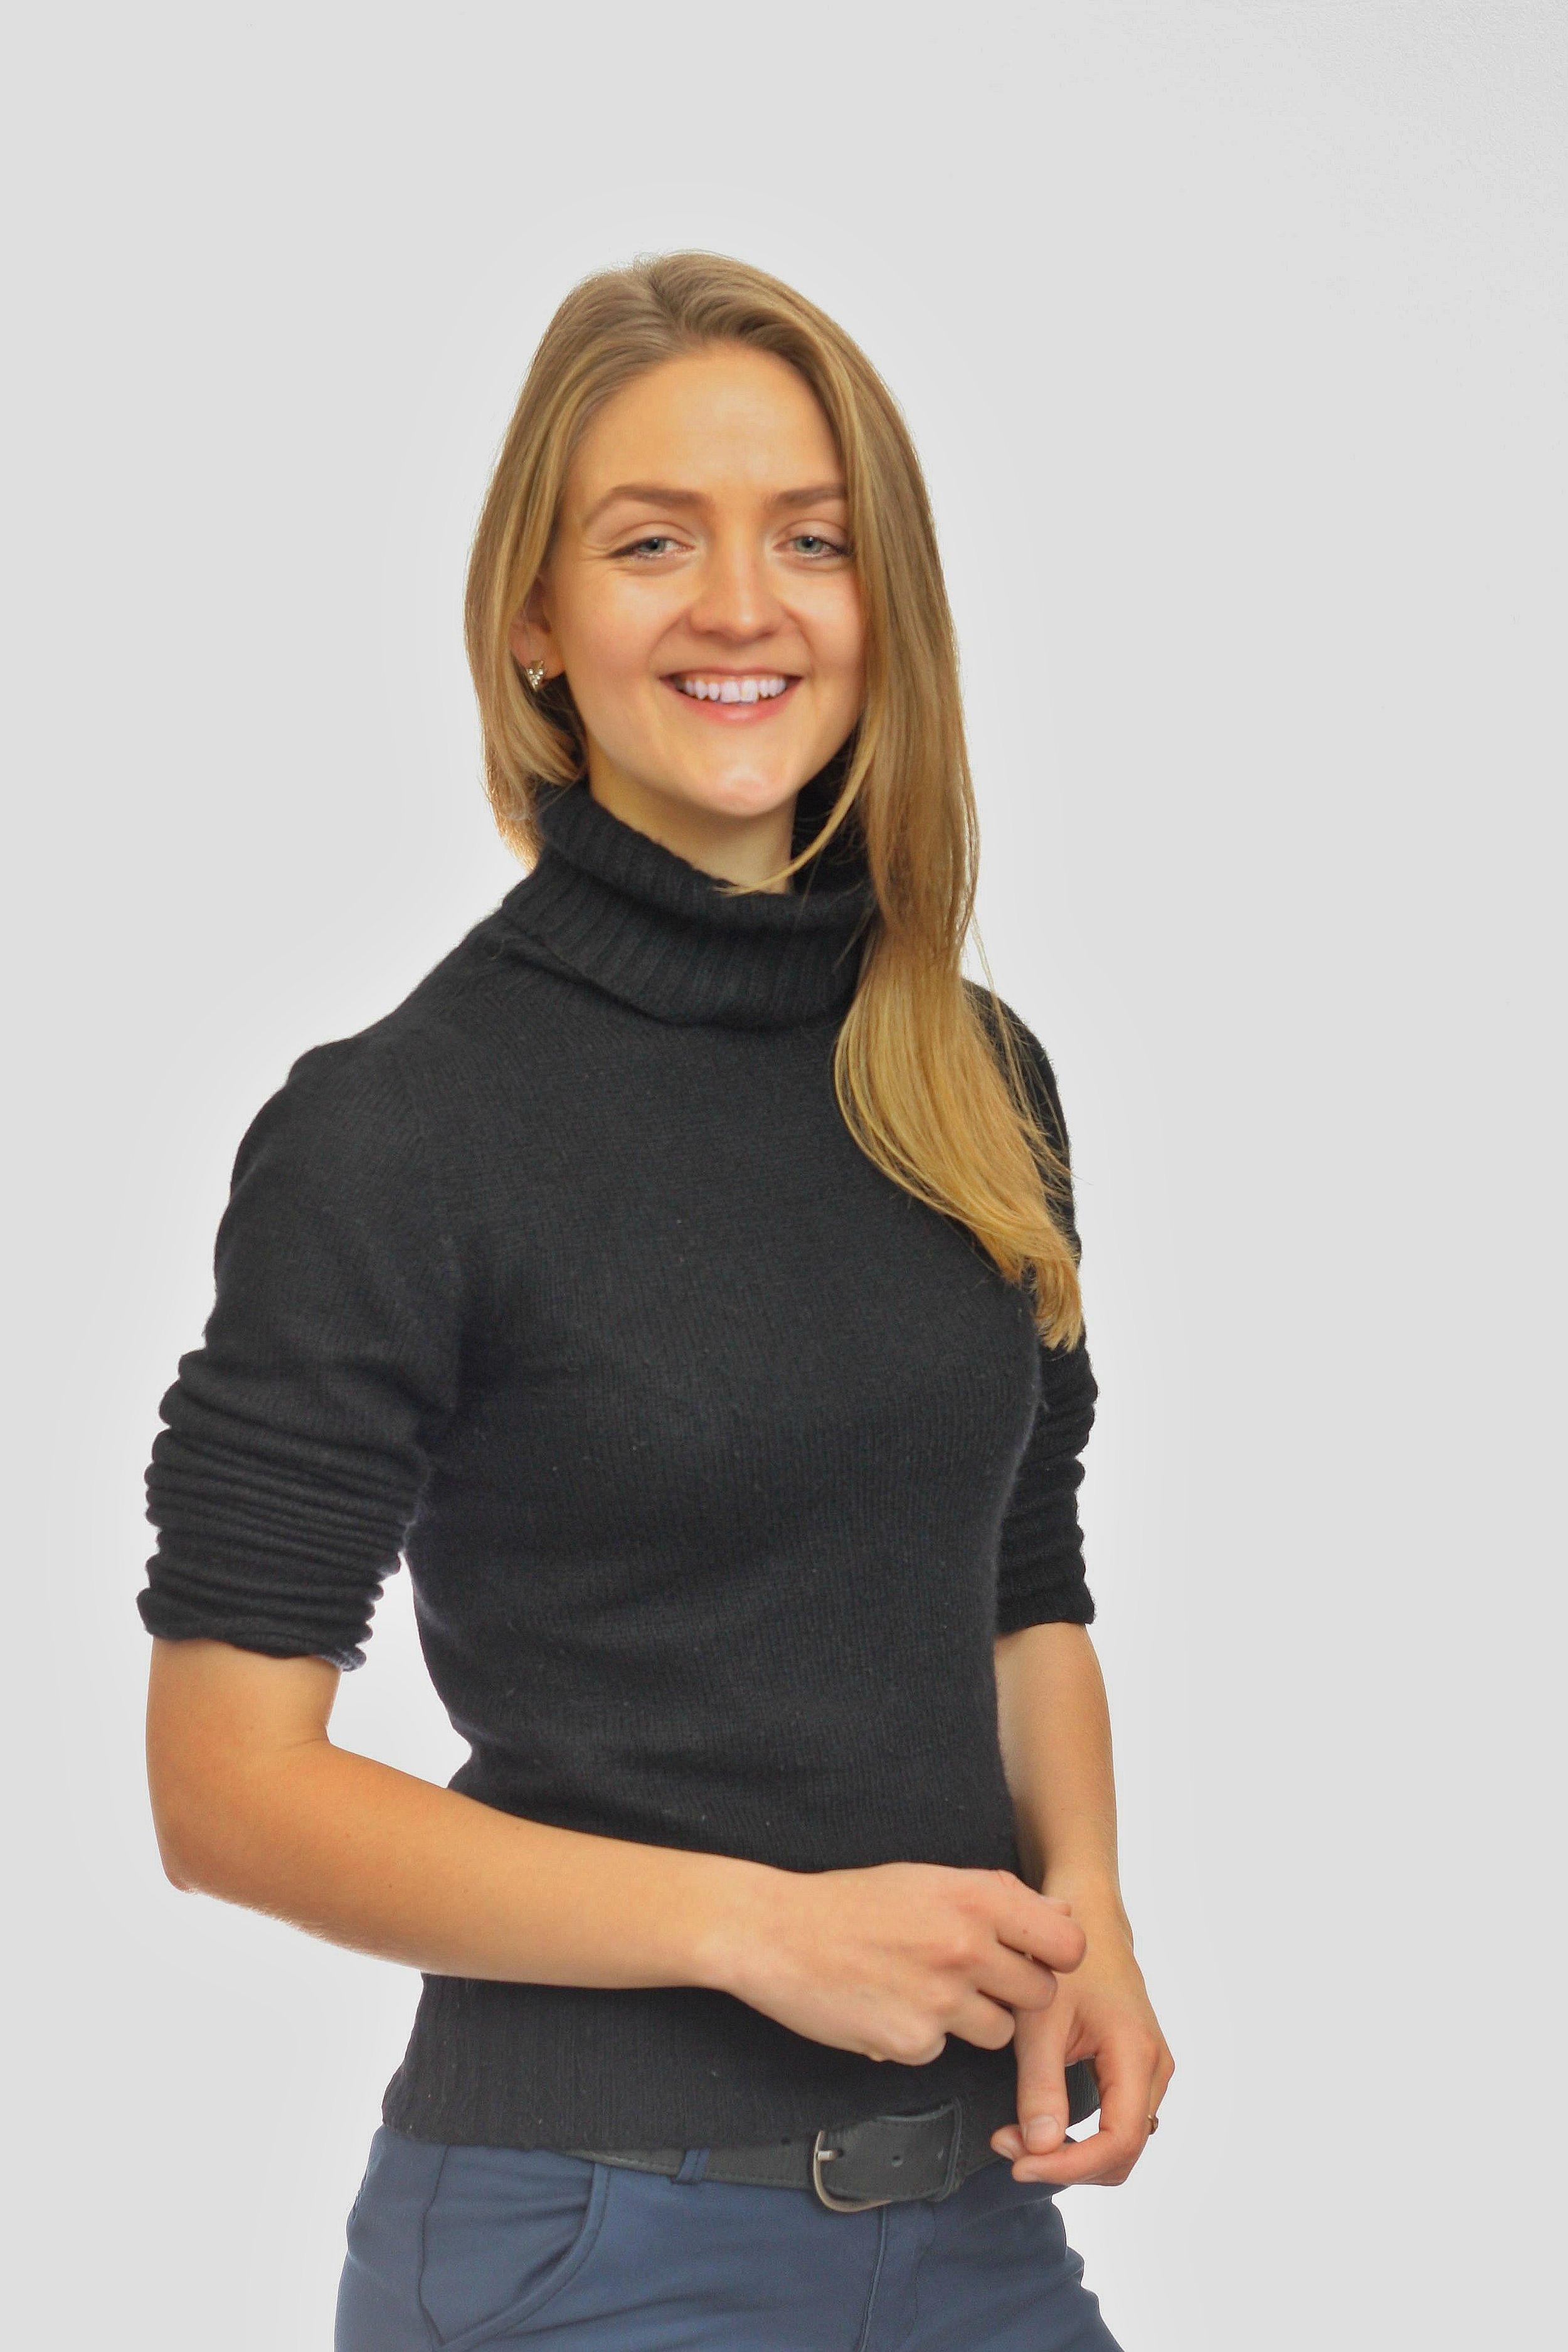 Zane Lanka  Fizikas skolotāja